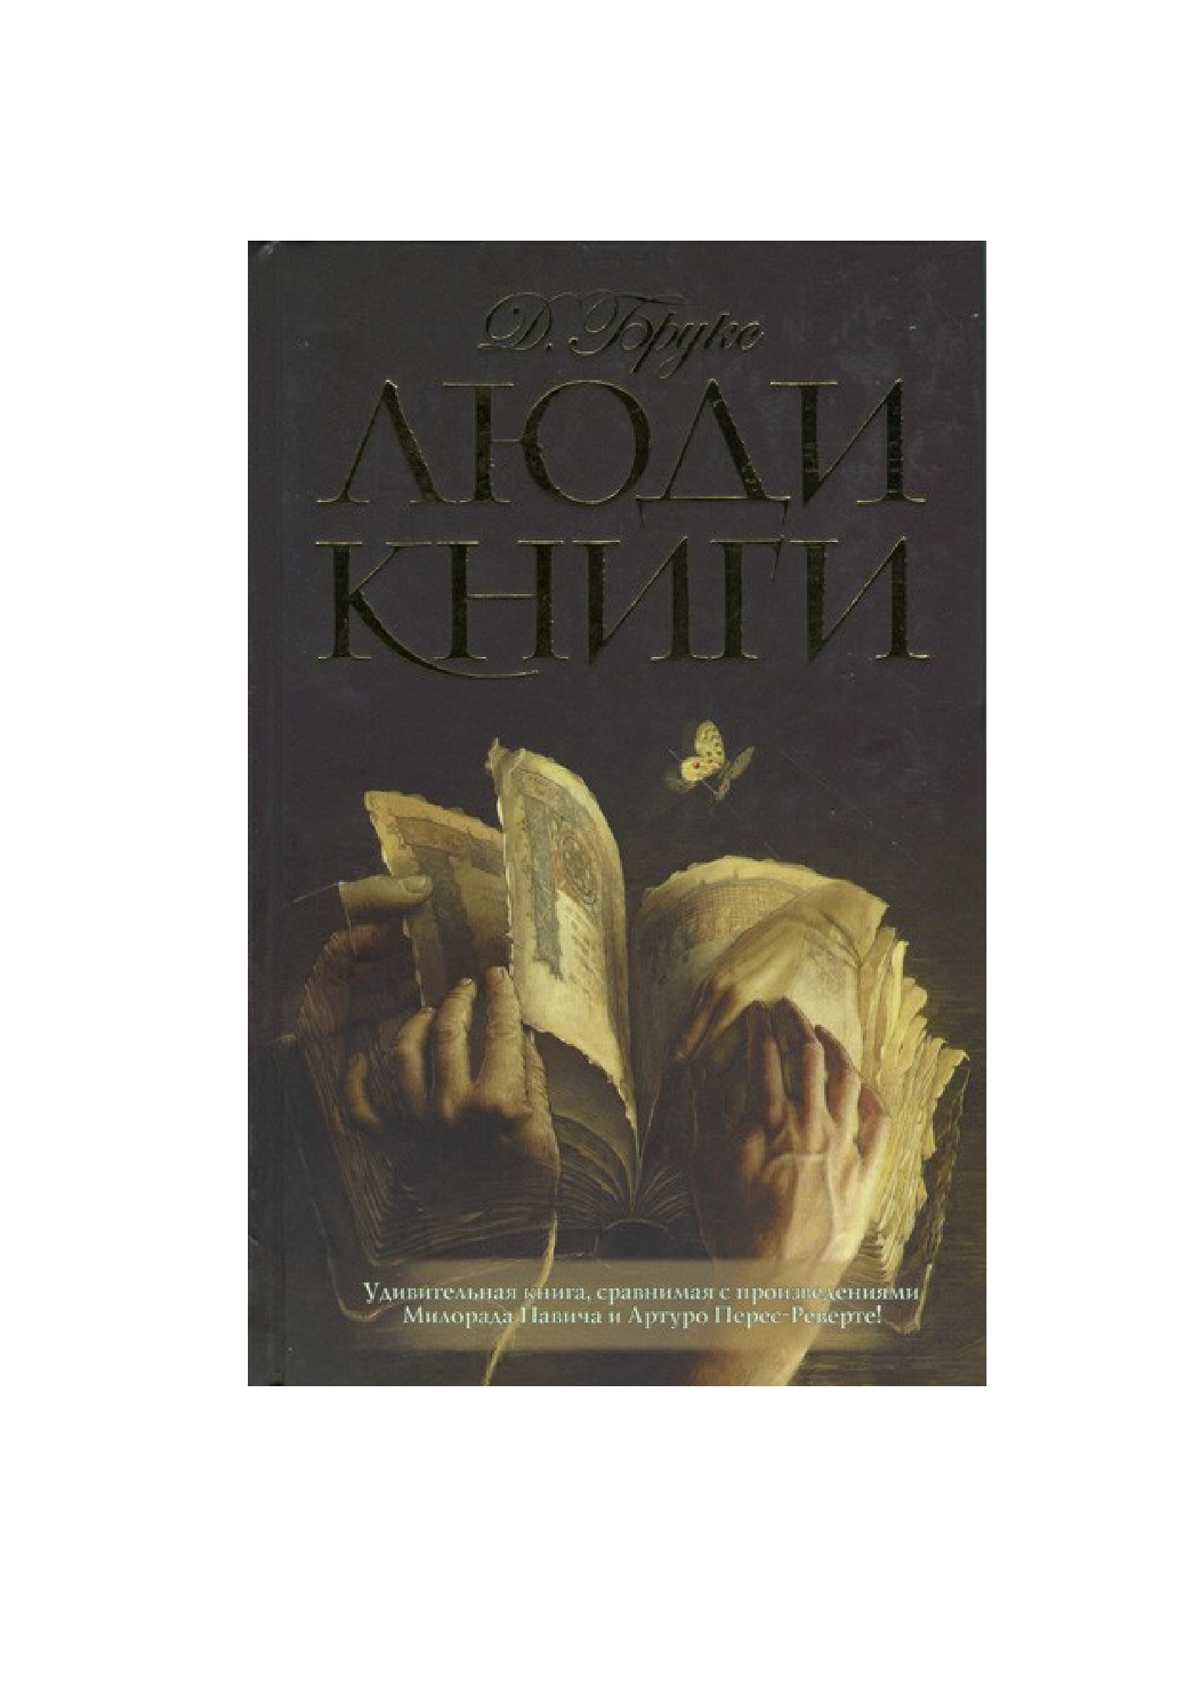 Calaméo - Джеральдина Брукс. Люди книги. 2a464e8e425